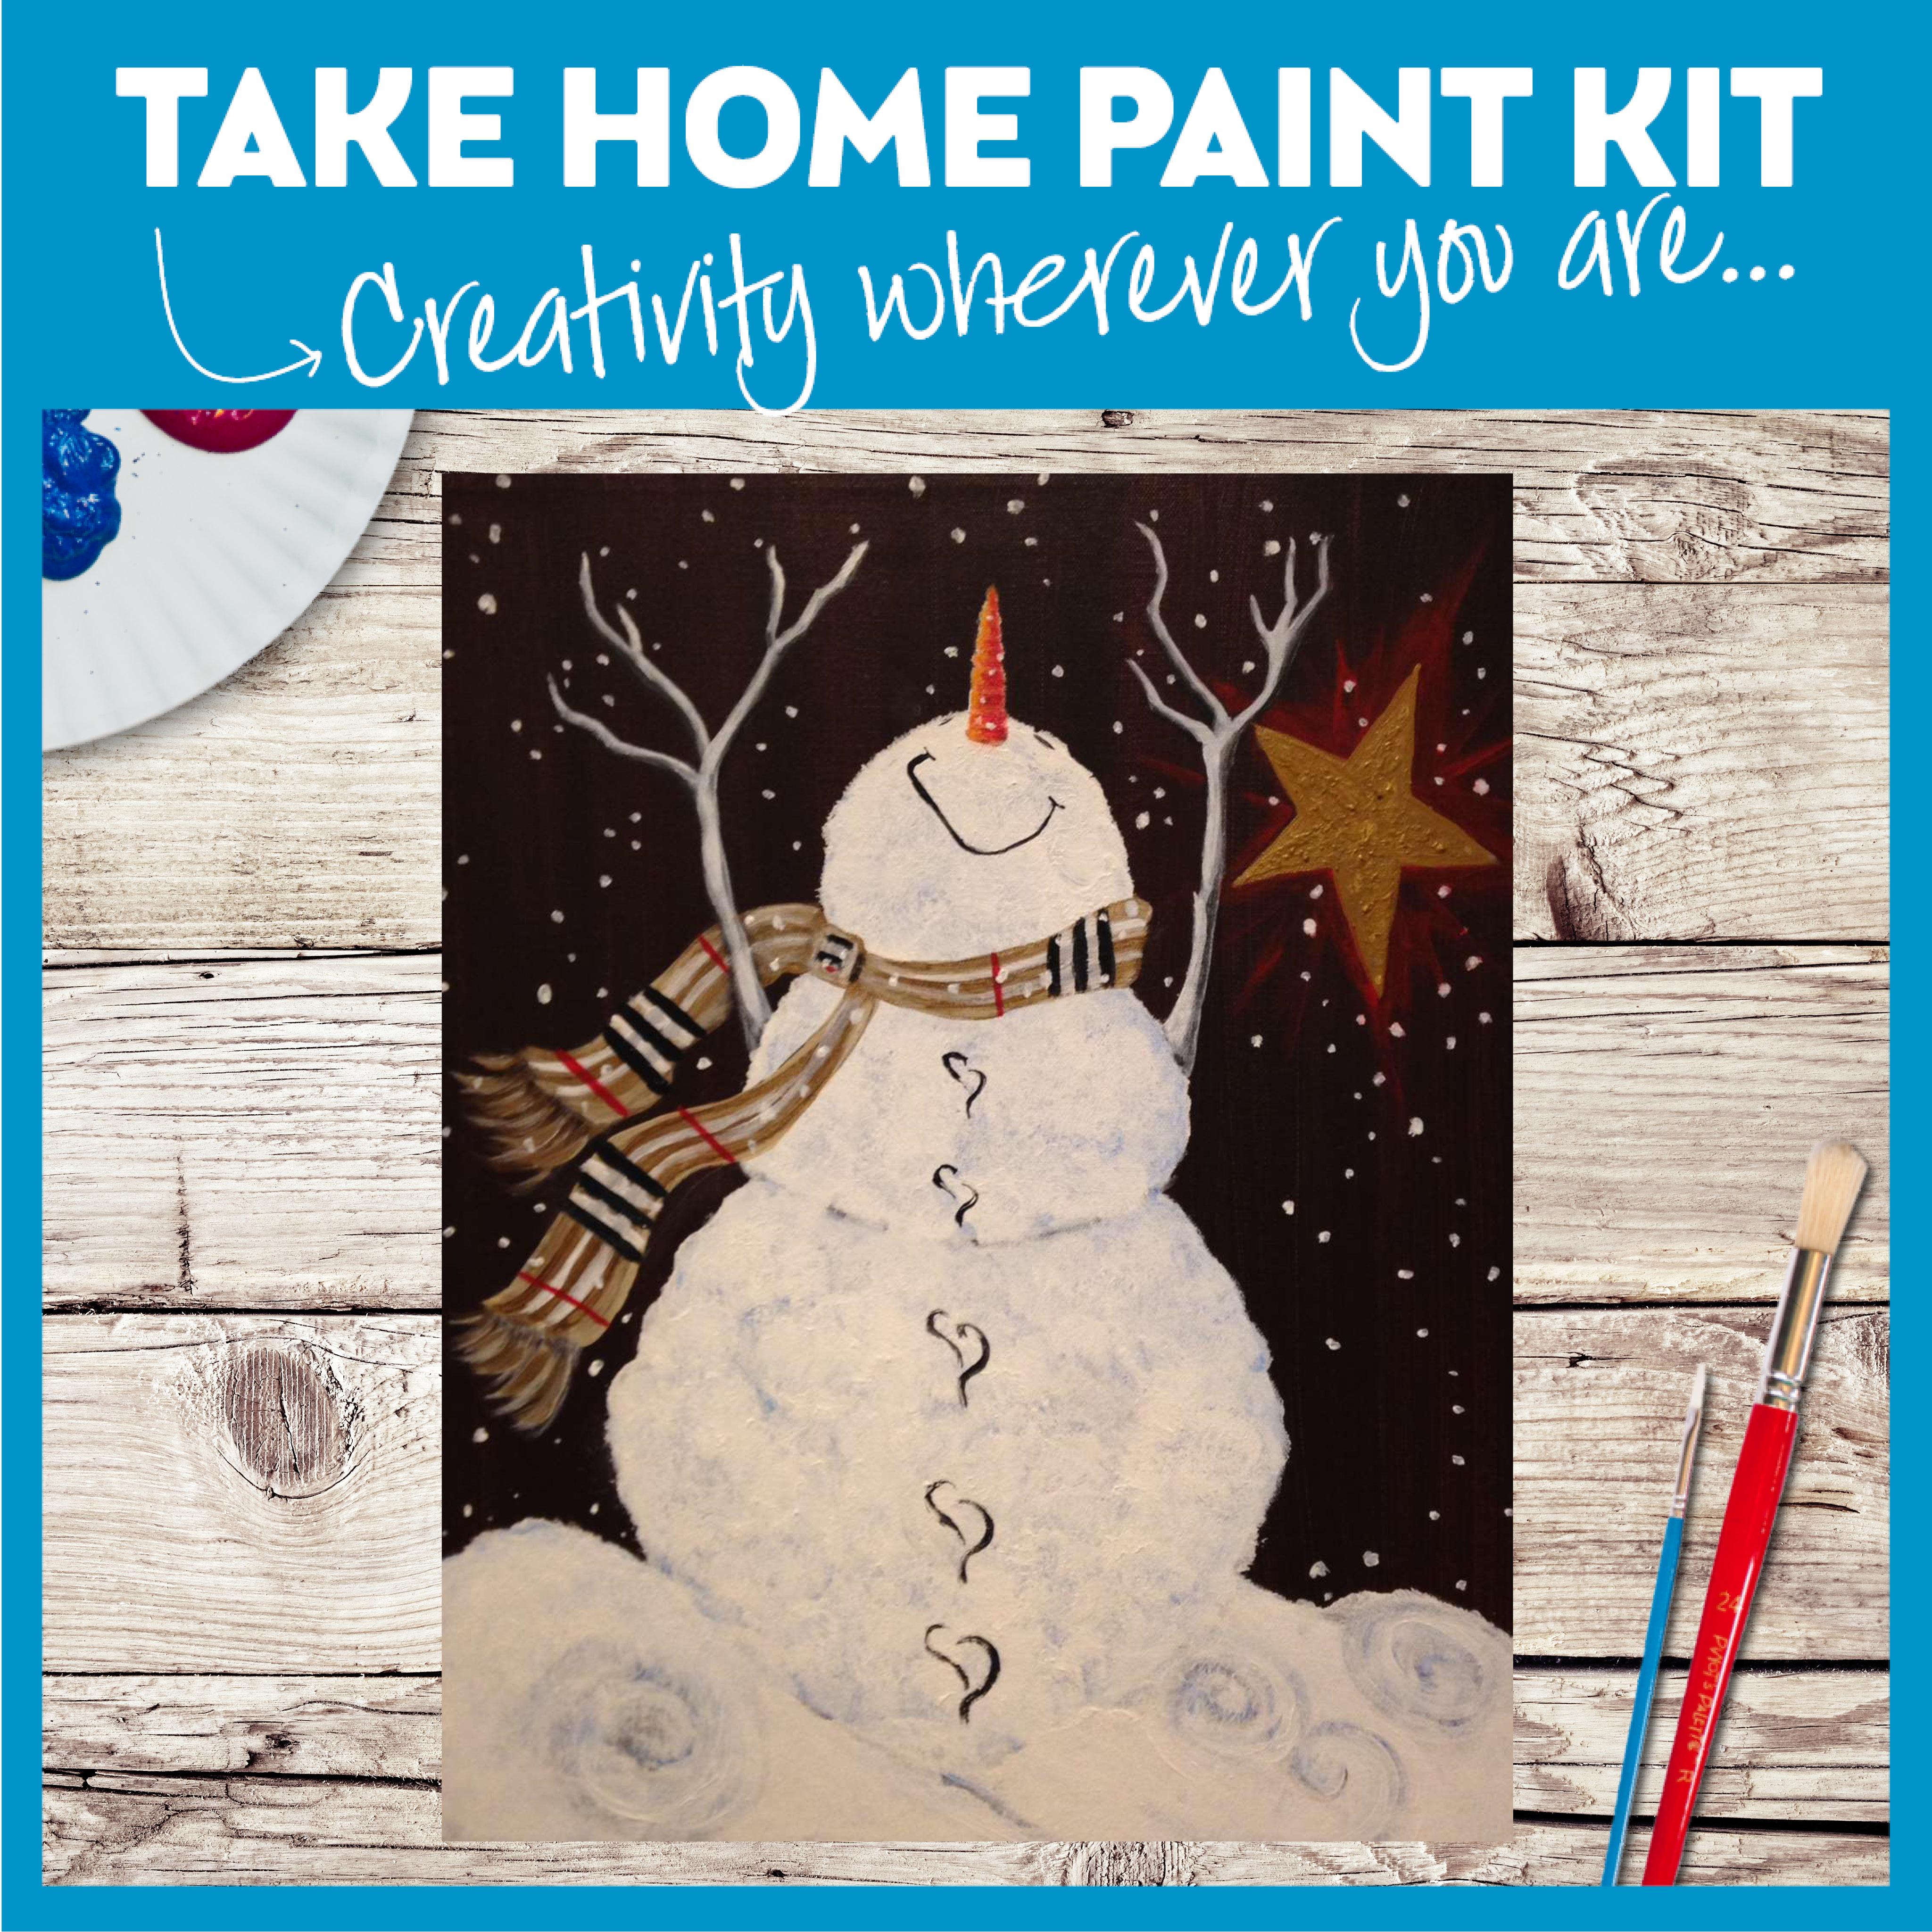 https://studio.pinotspalette.com/cherrystreet/images/snowmansblisskit.jpg